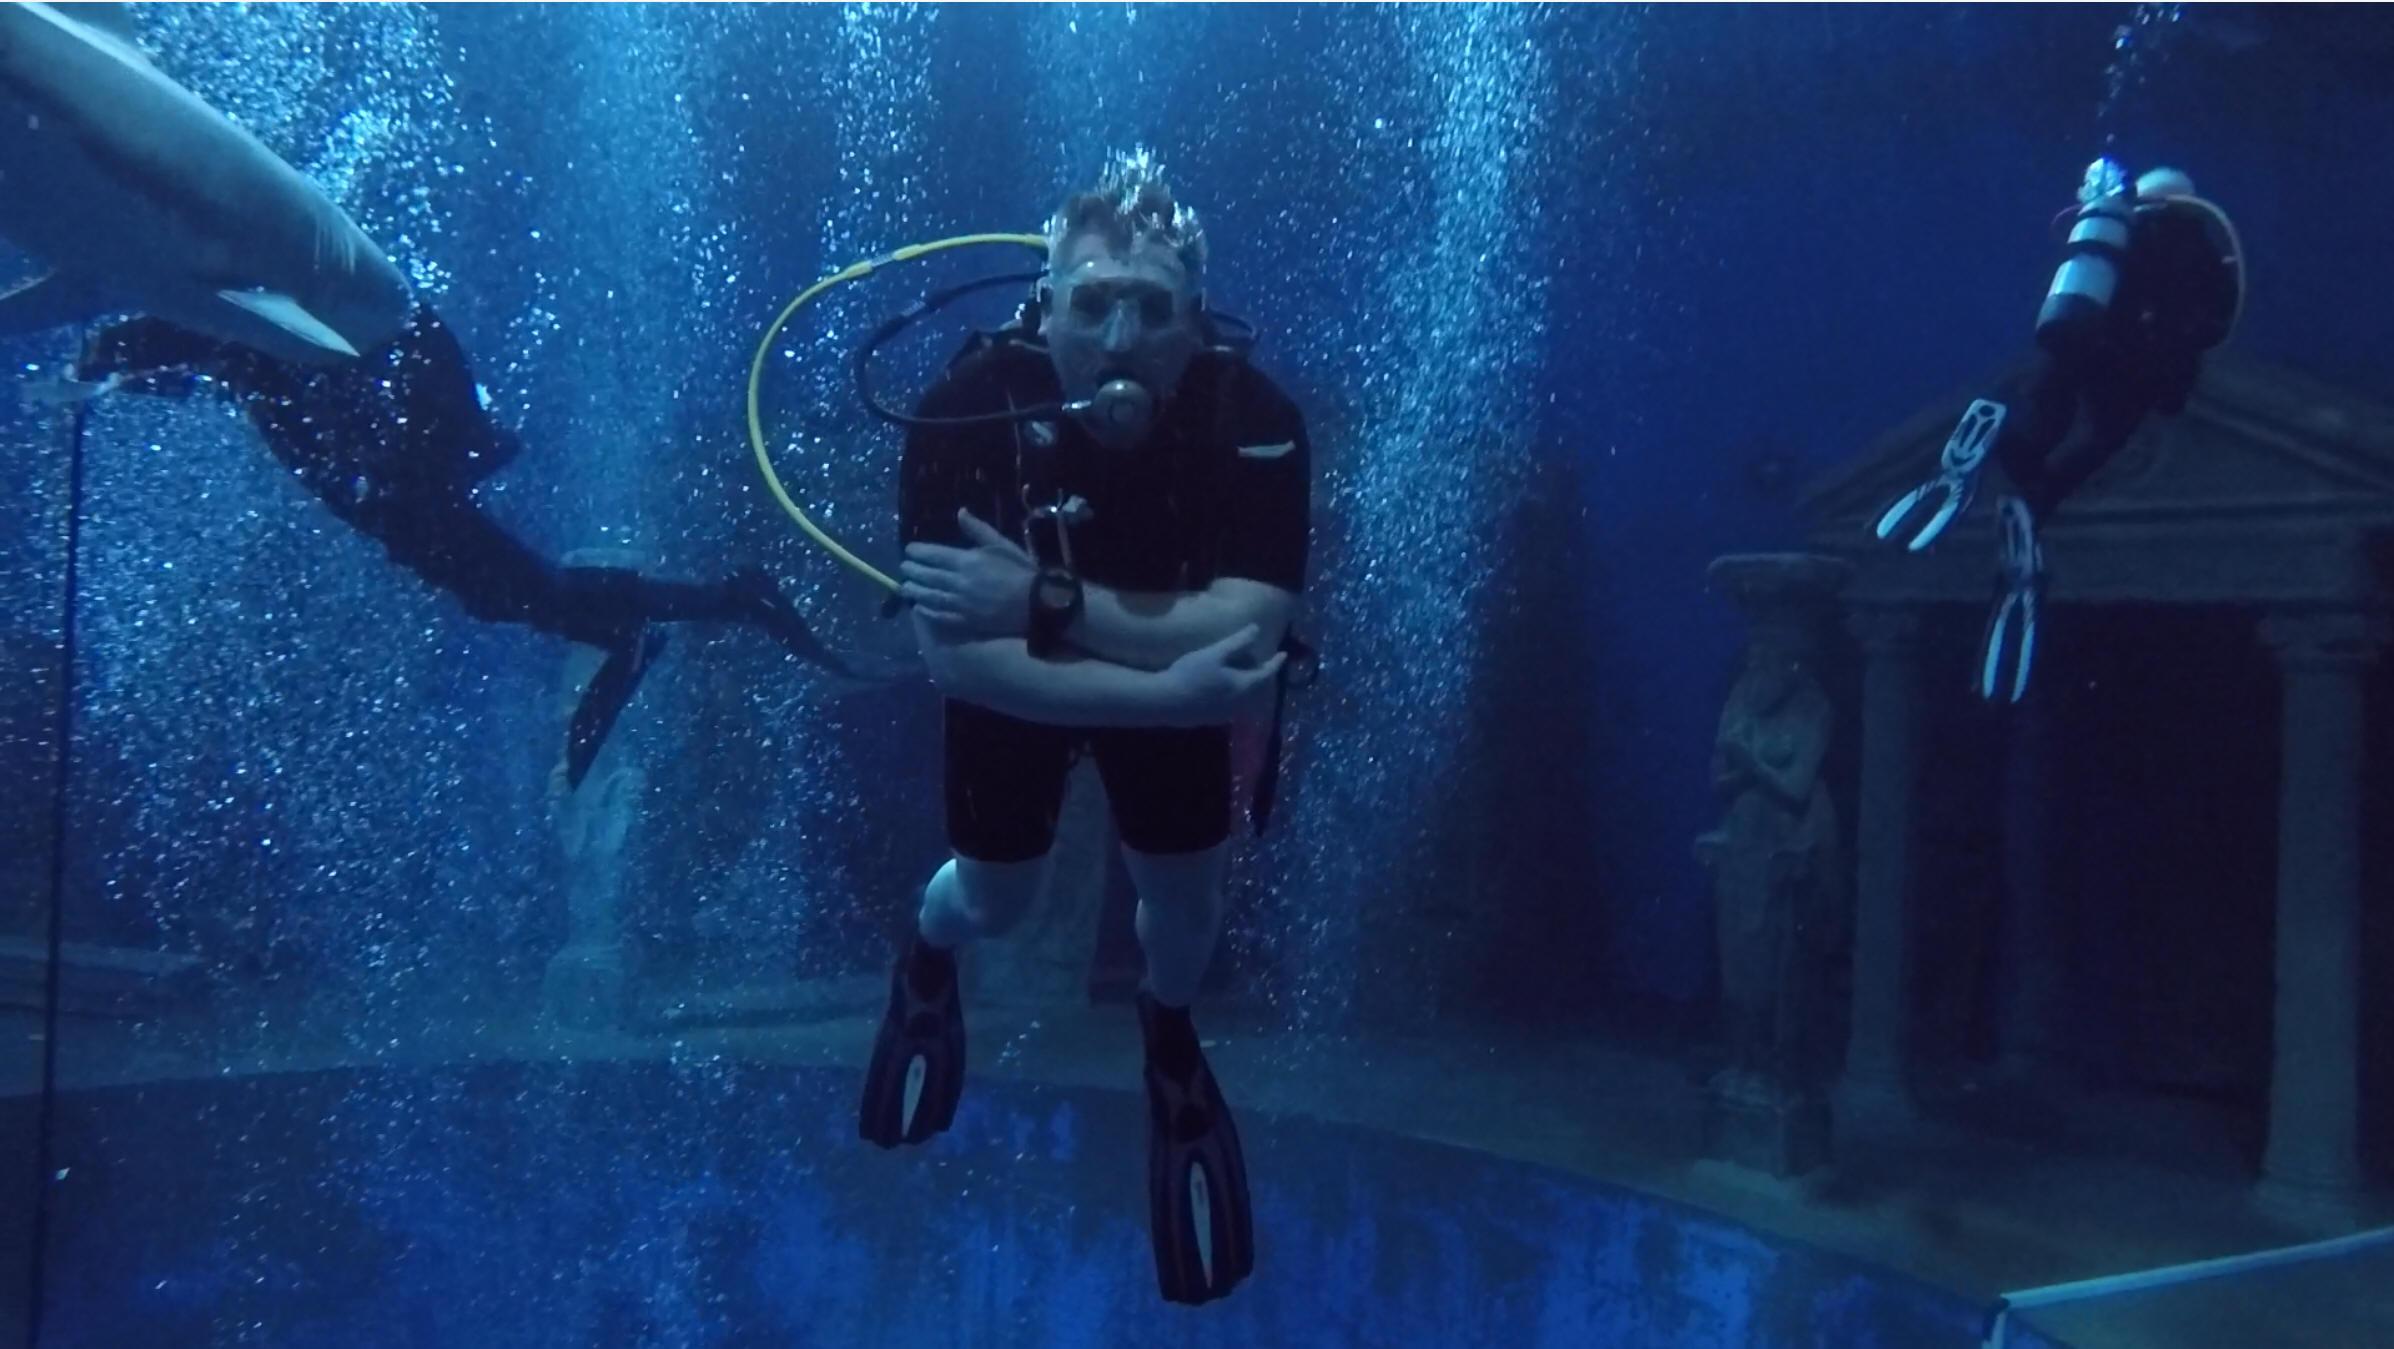 201801_CPS_Sortie Fosse Dive4Life_018